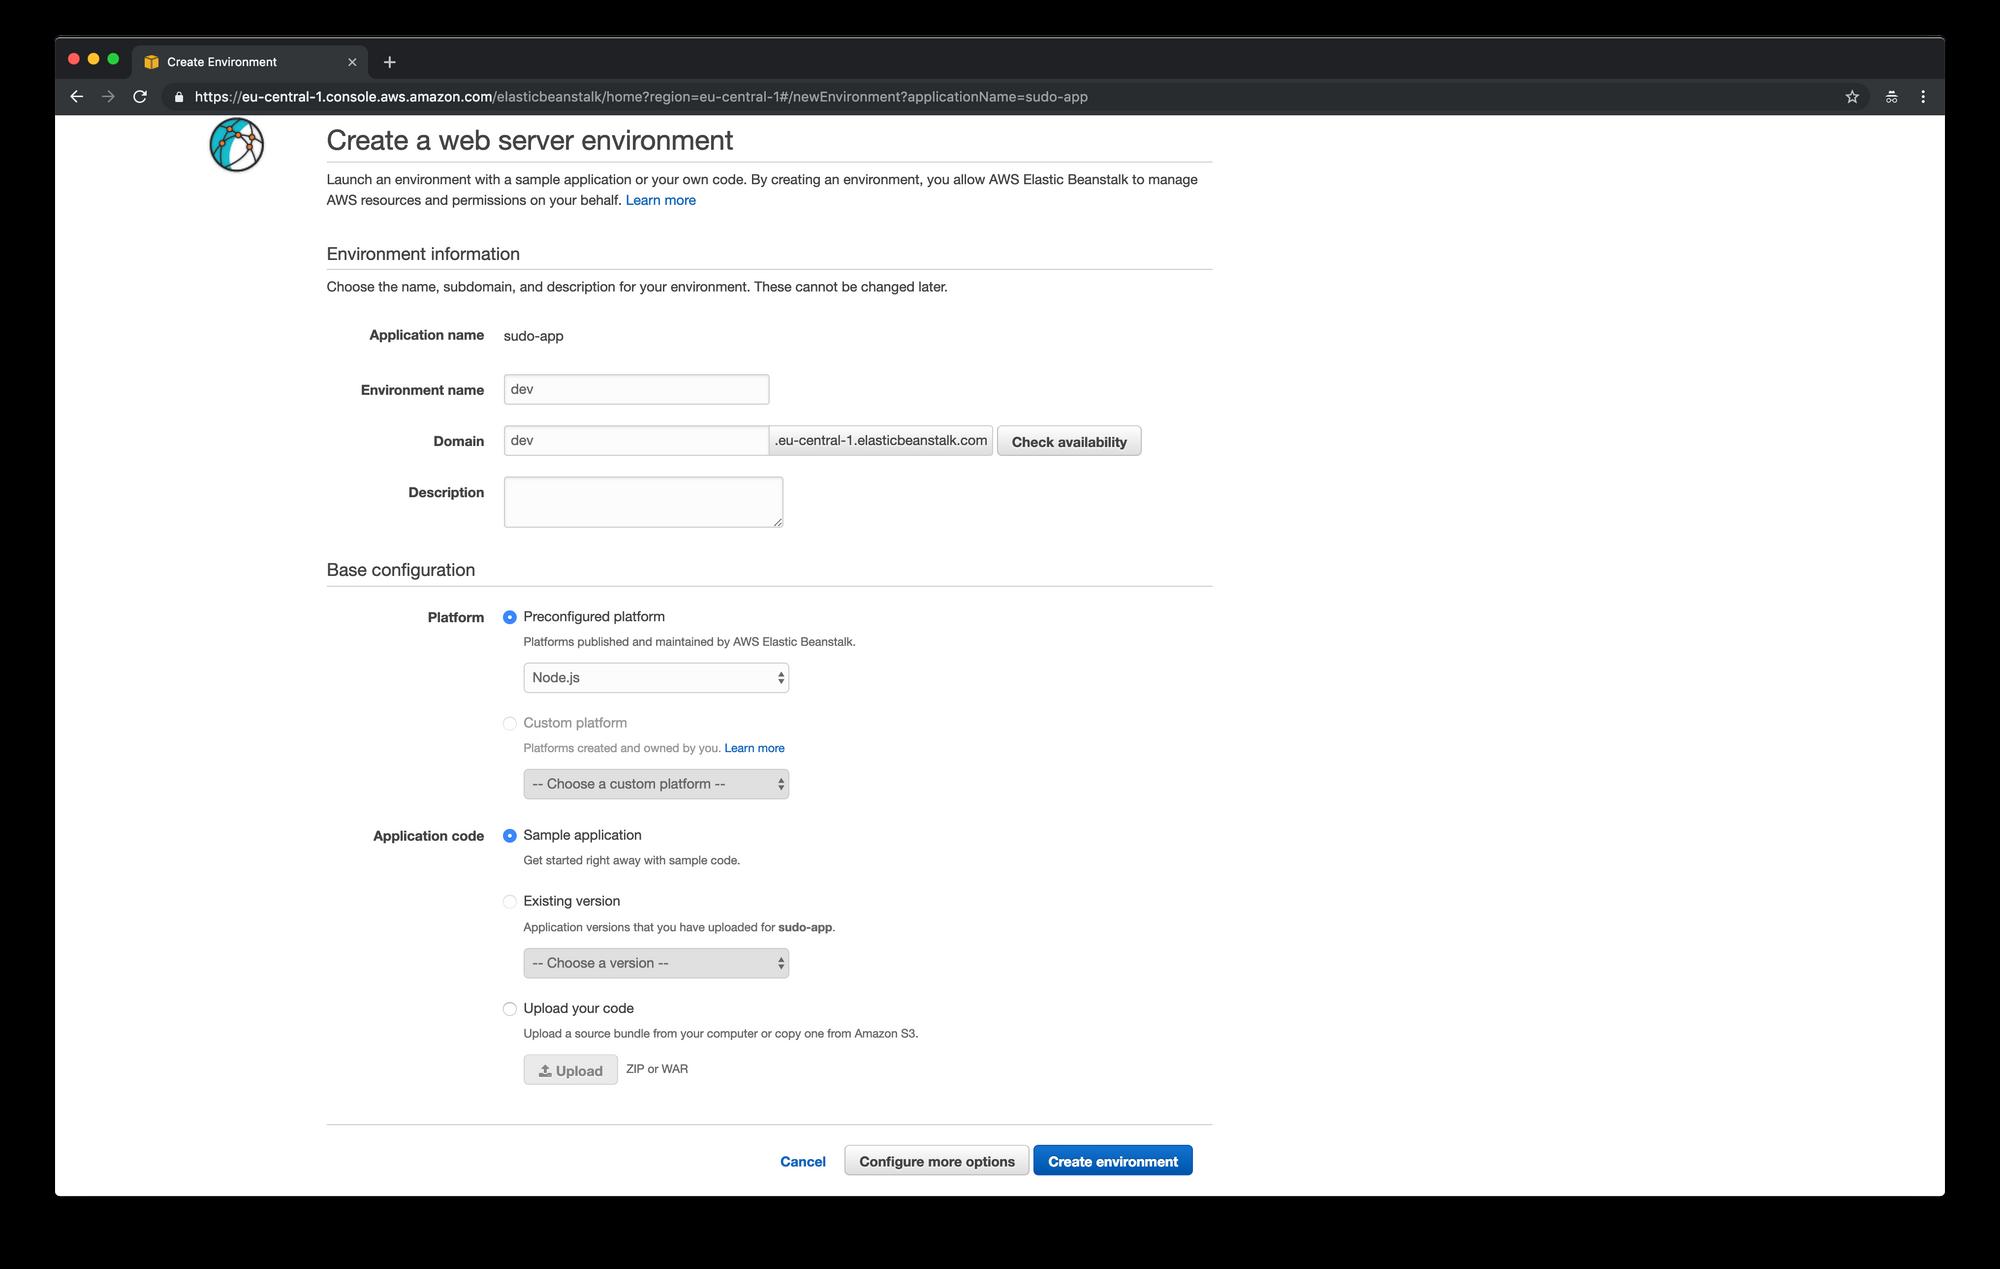 AWS Elastic Beanstalk - create a web server environment